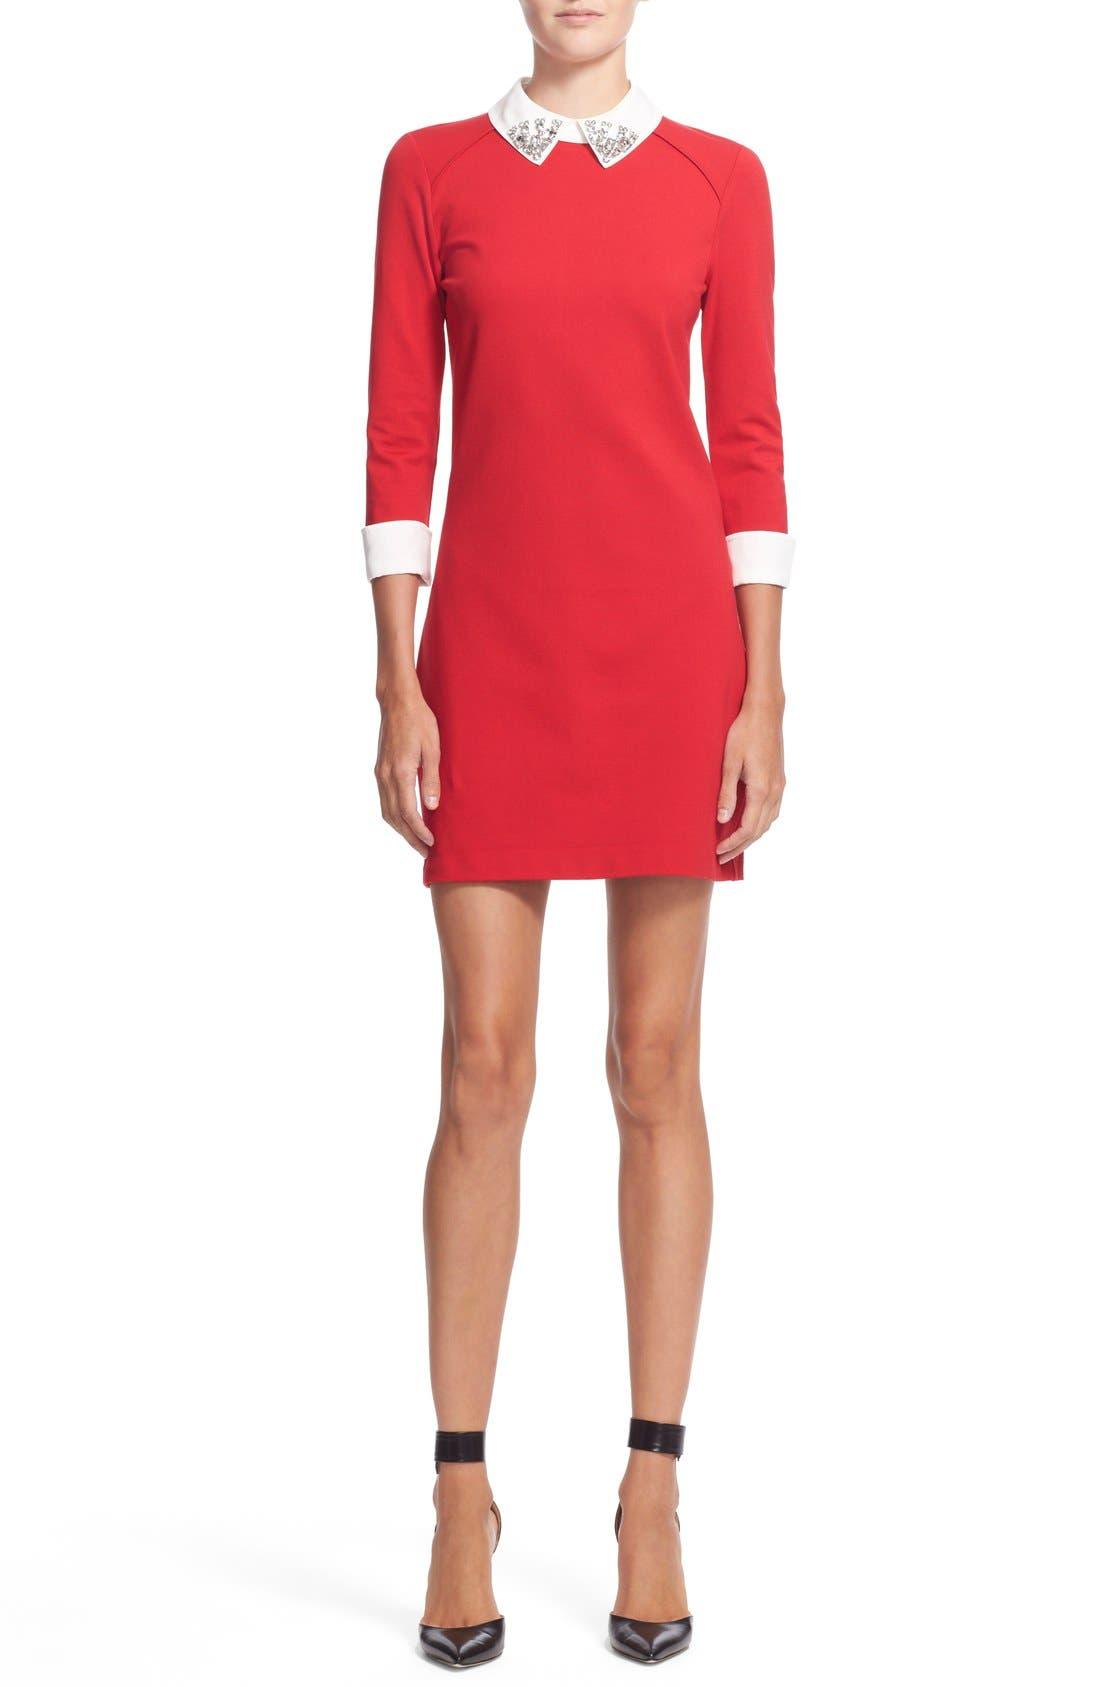 Alternate Image 1 Selected - Ted Baker London 'Eelah' Embellished Collar Shift Dress